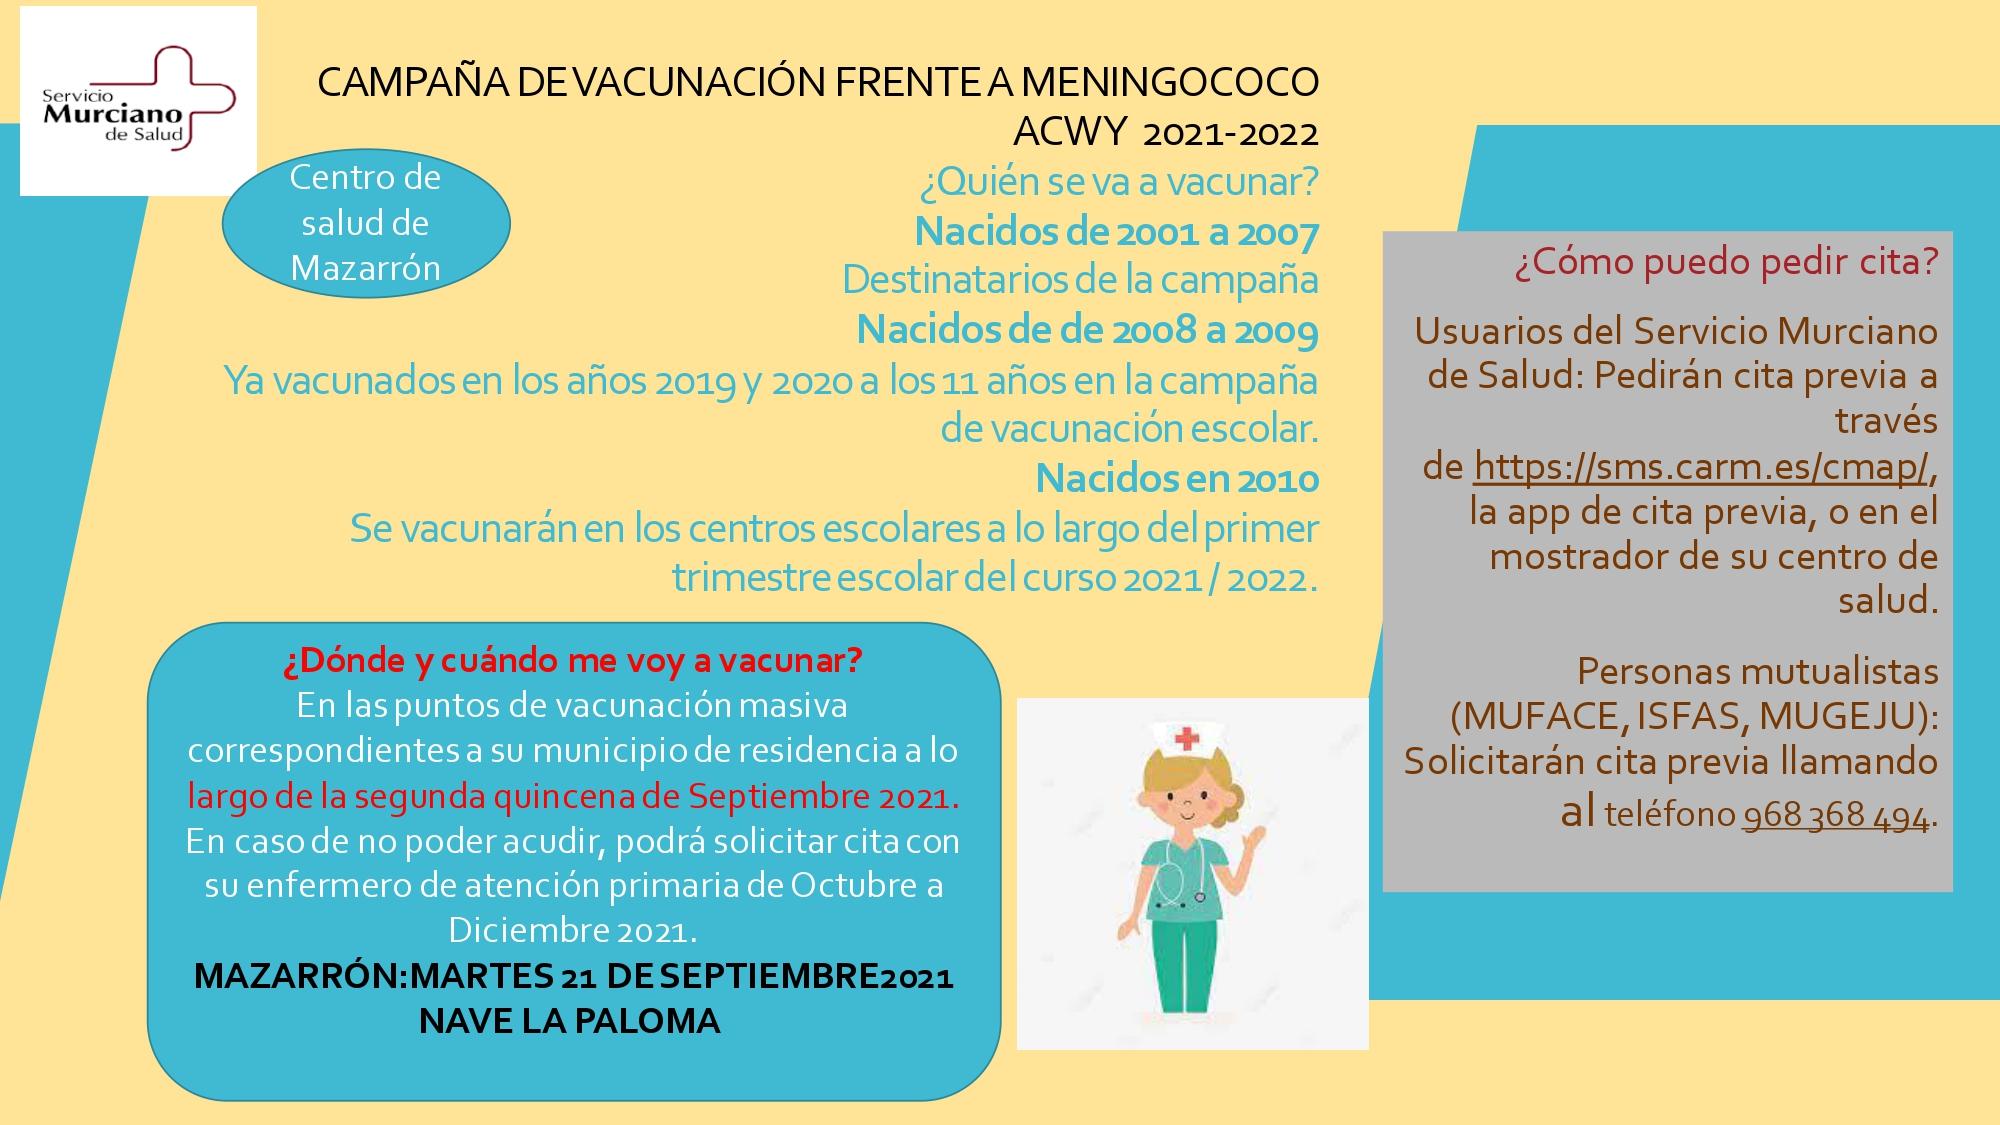 Vaccination calendar of the Region of Murcia